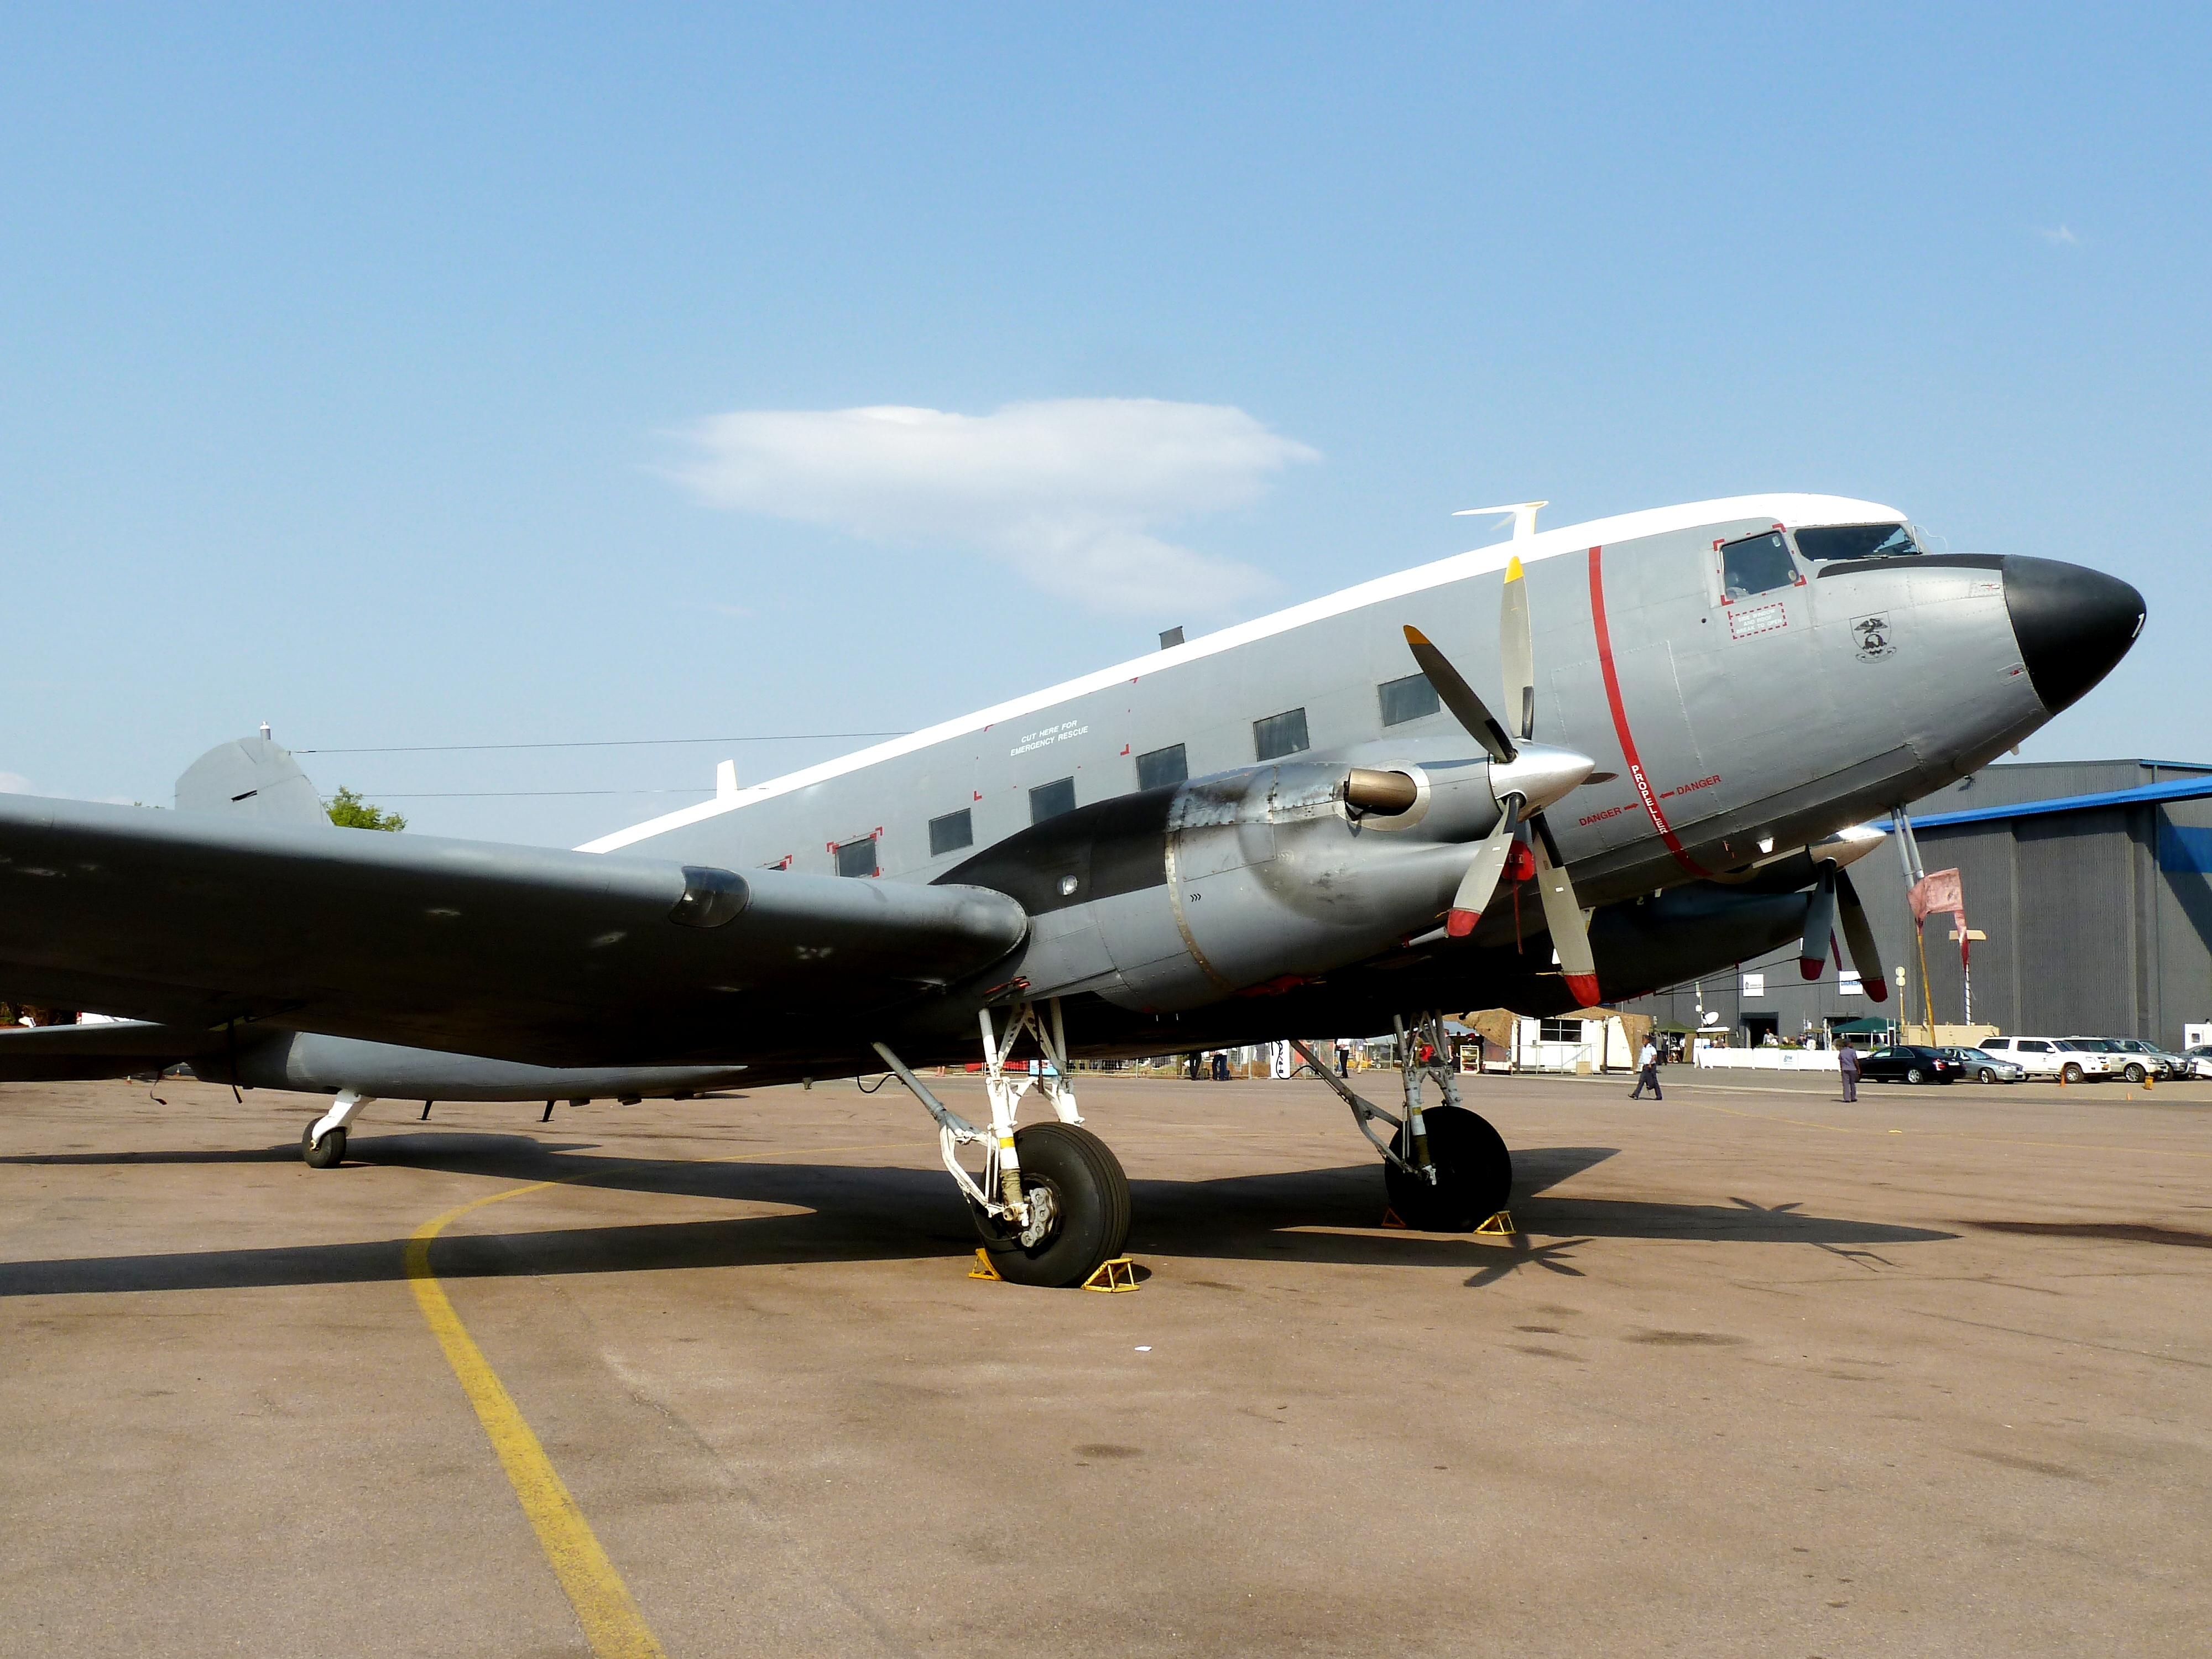 File:C-47TP Dakota, a, Waterkloof Lugmagbasis jpg - Wikimedia Commons